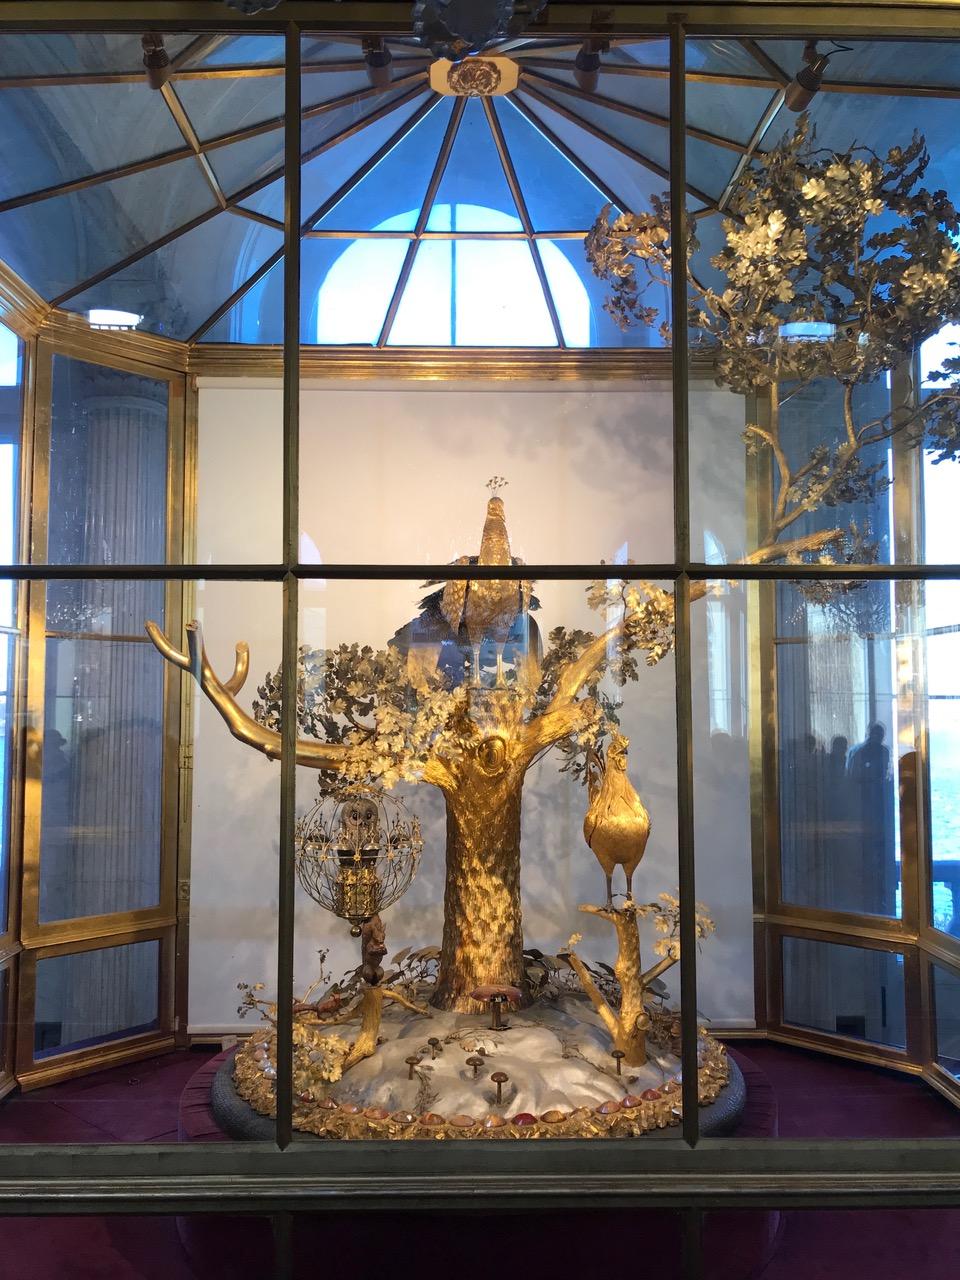 The Peacock Clock at the Hermitage Museum, Saint Petersburg